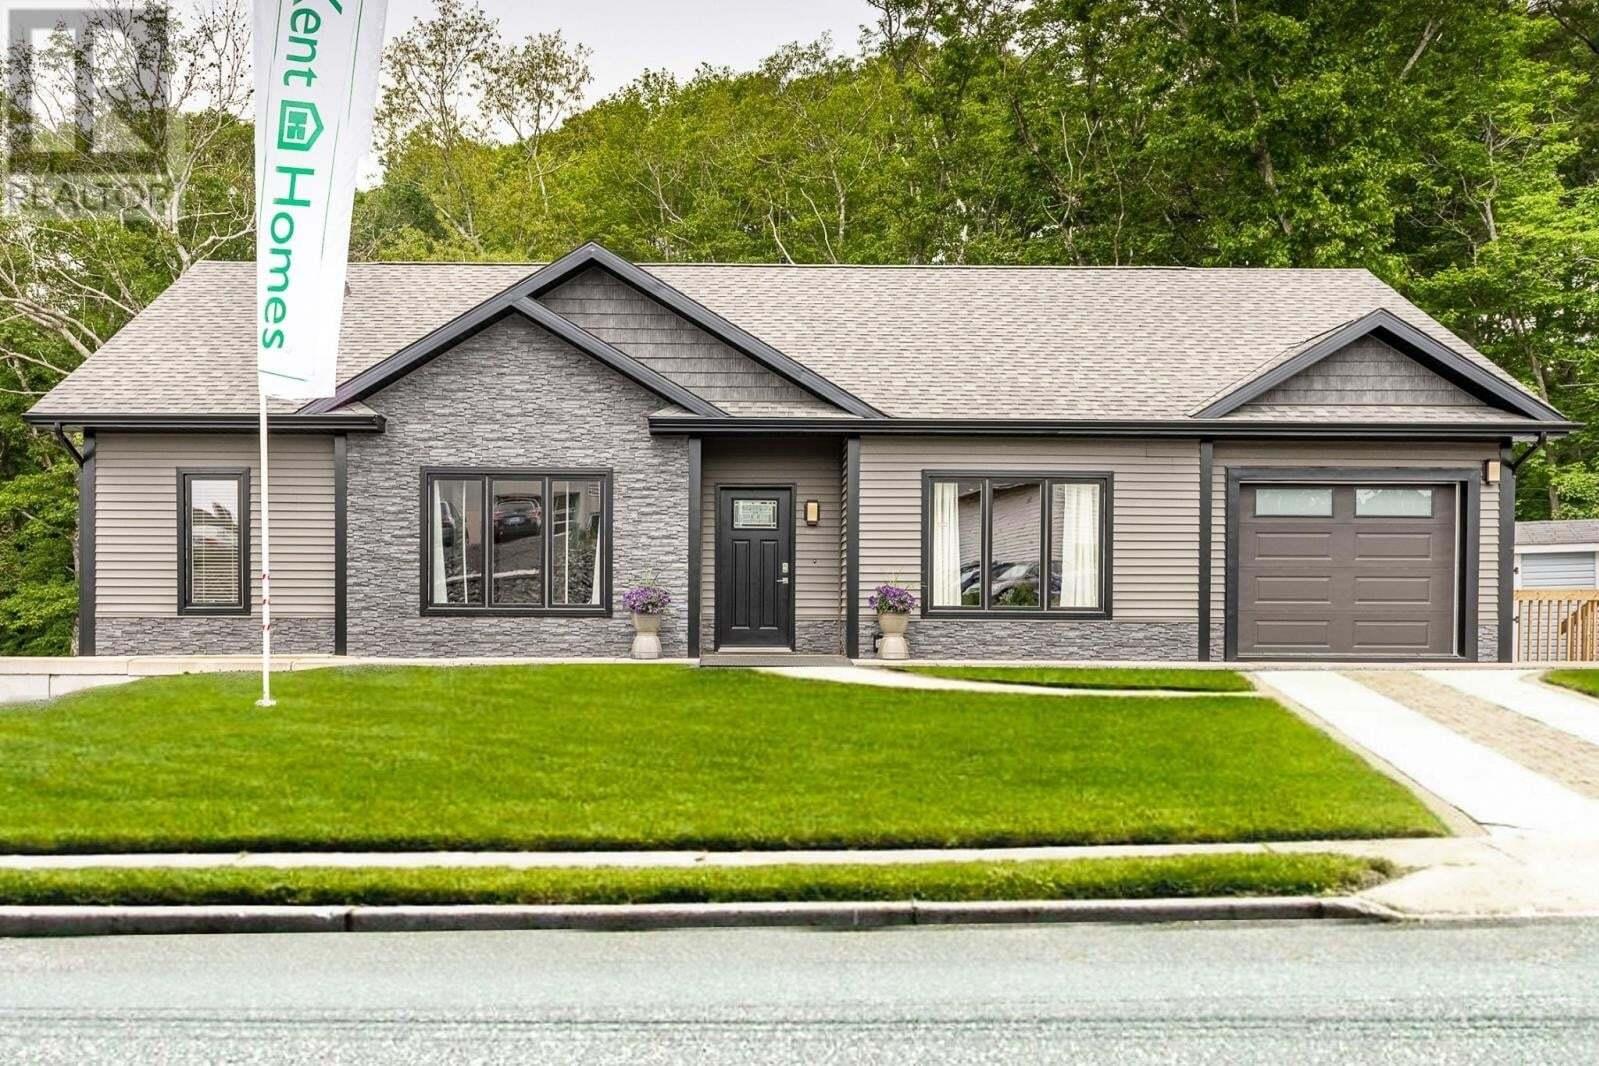 House for sale at 10 Bugden Dr Portugal Cove Newfoundland - MLS: 1206966